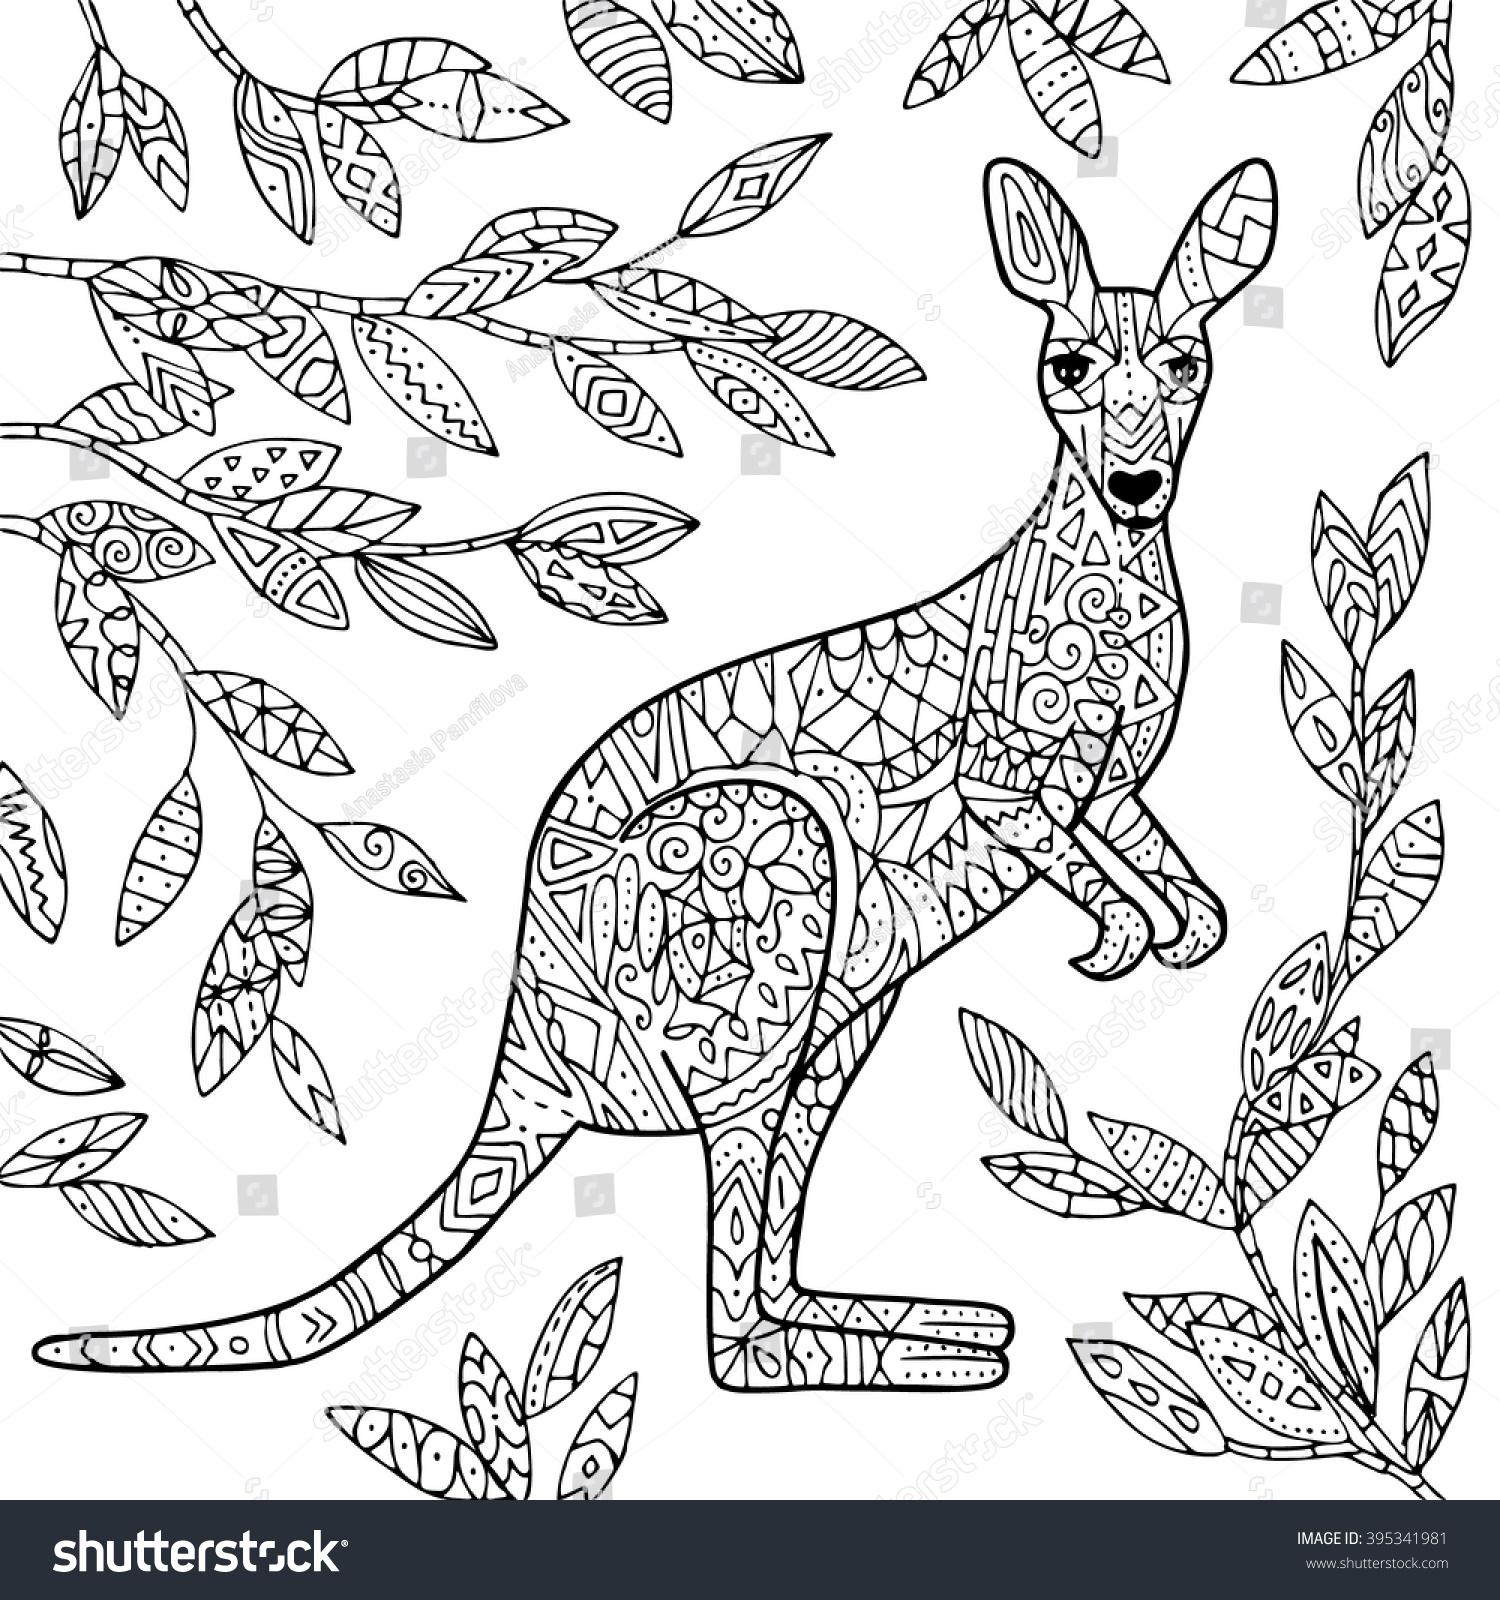 Free coloring pages kangaroo - Vector Kangaroo Illustration Adult Coloring Page